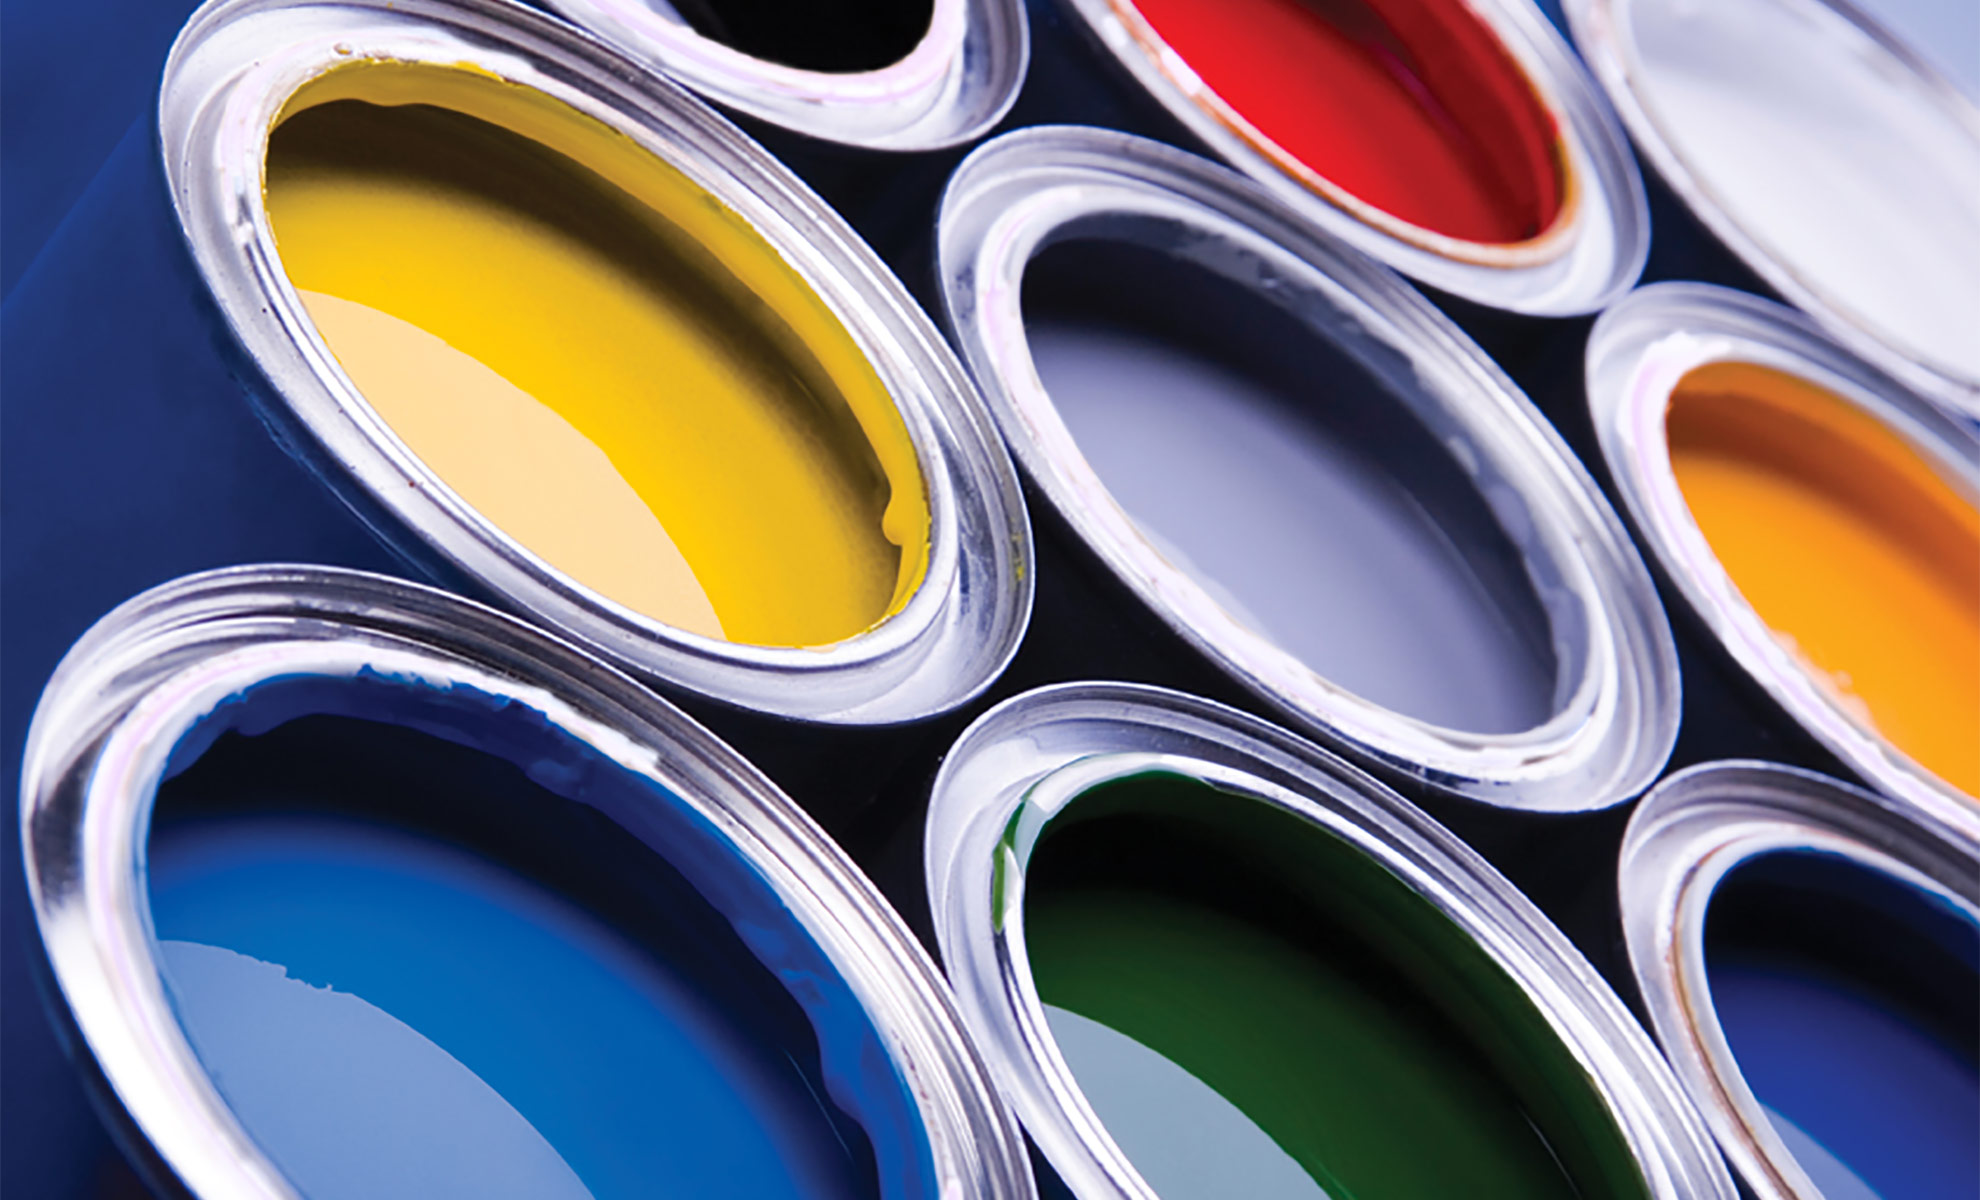 epoxy-lantai-untuk-industri